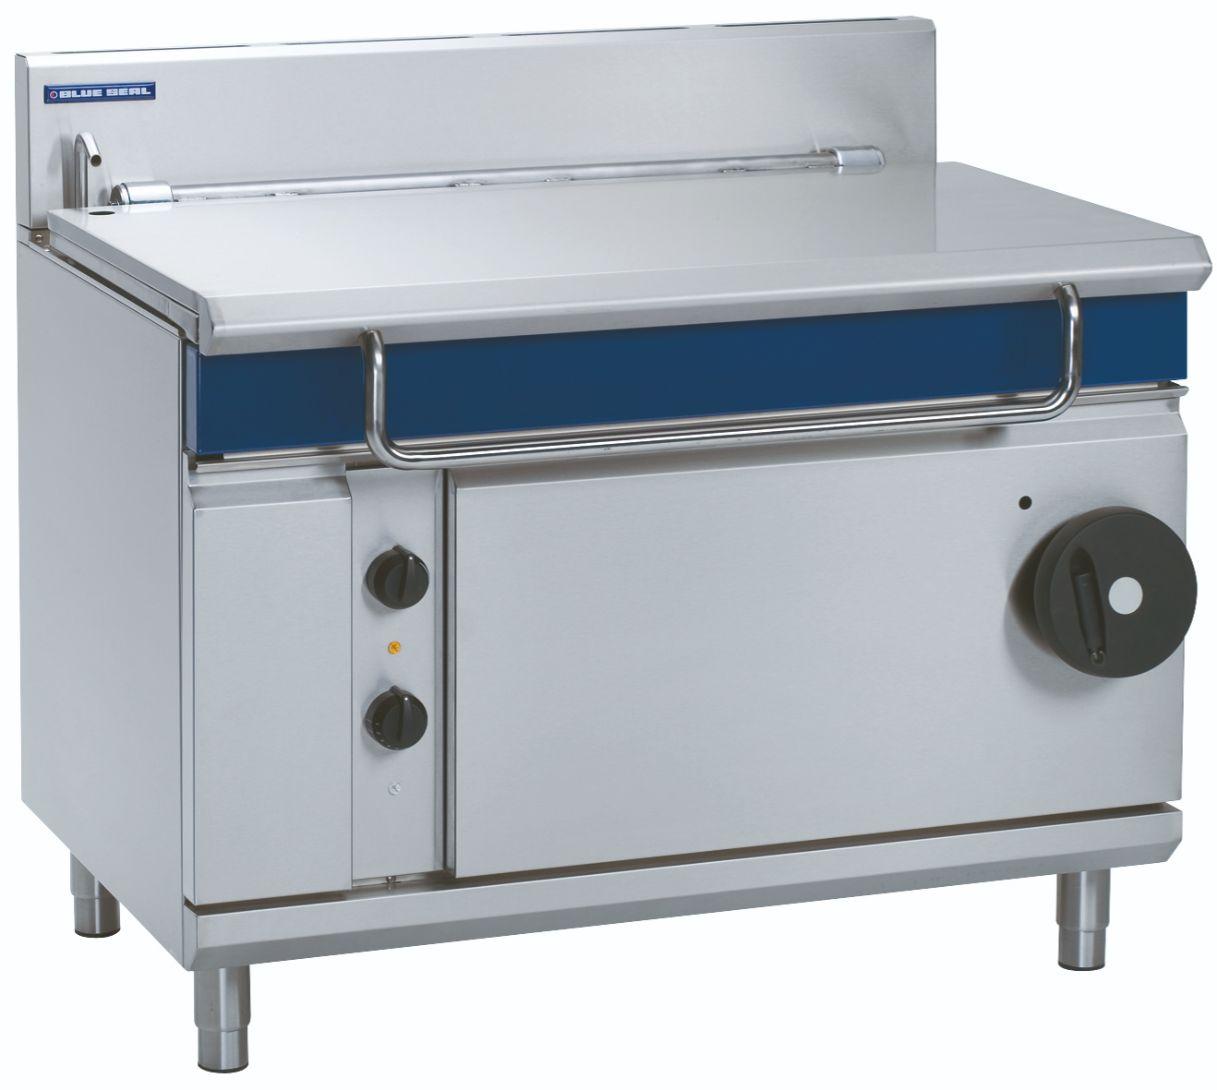 Blue Seal Evolution Series G580-12 - 1200mm Gas Tilting Bratt Pan